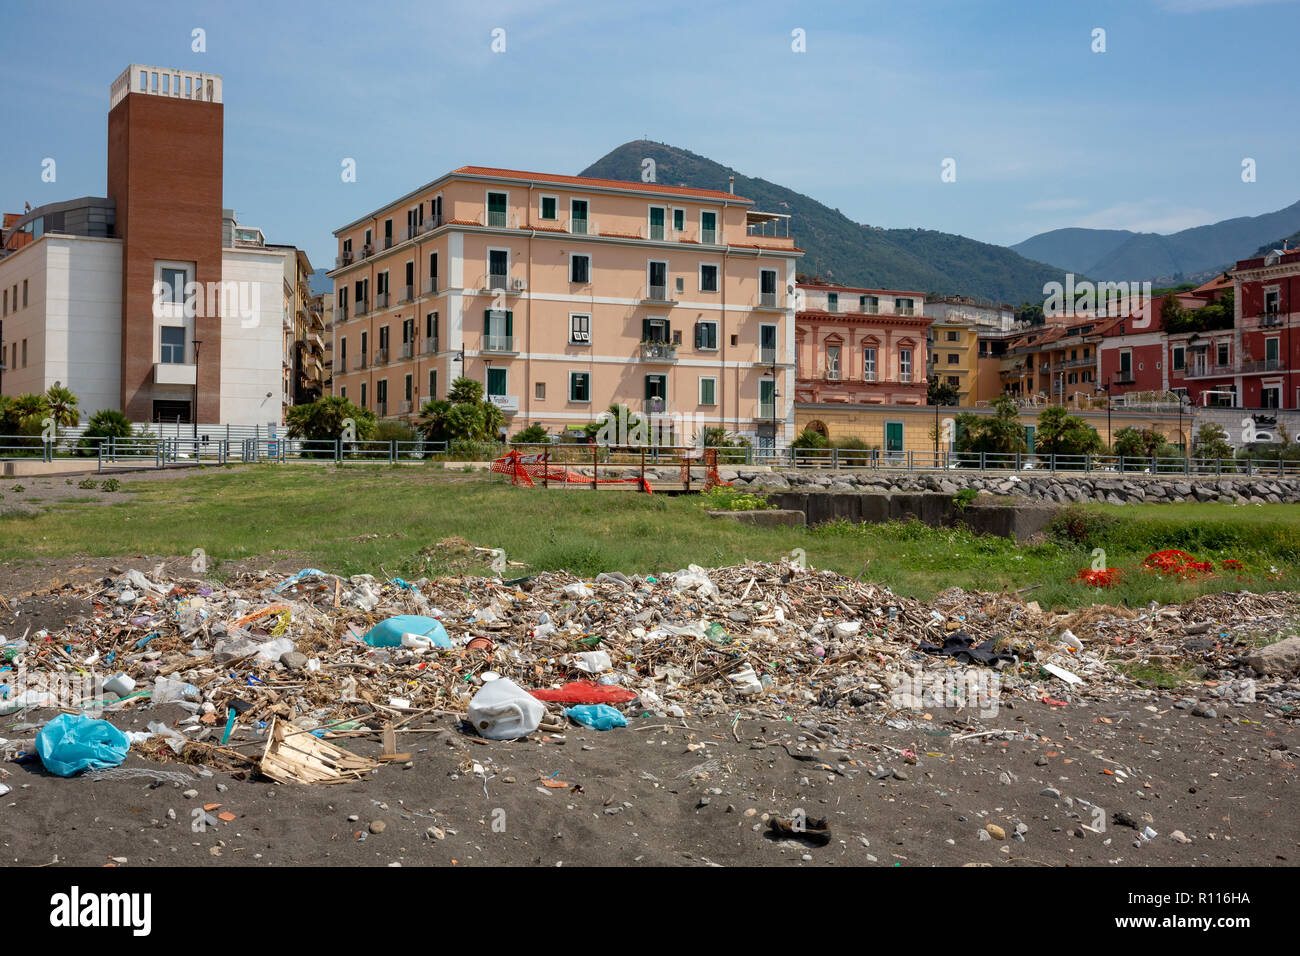 Polluted beach in castellammare di stabia Italy - Stock Image